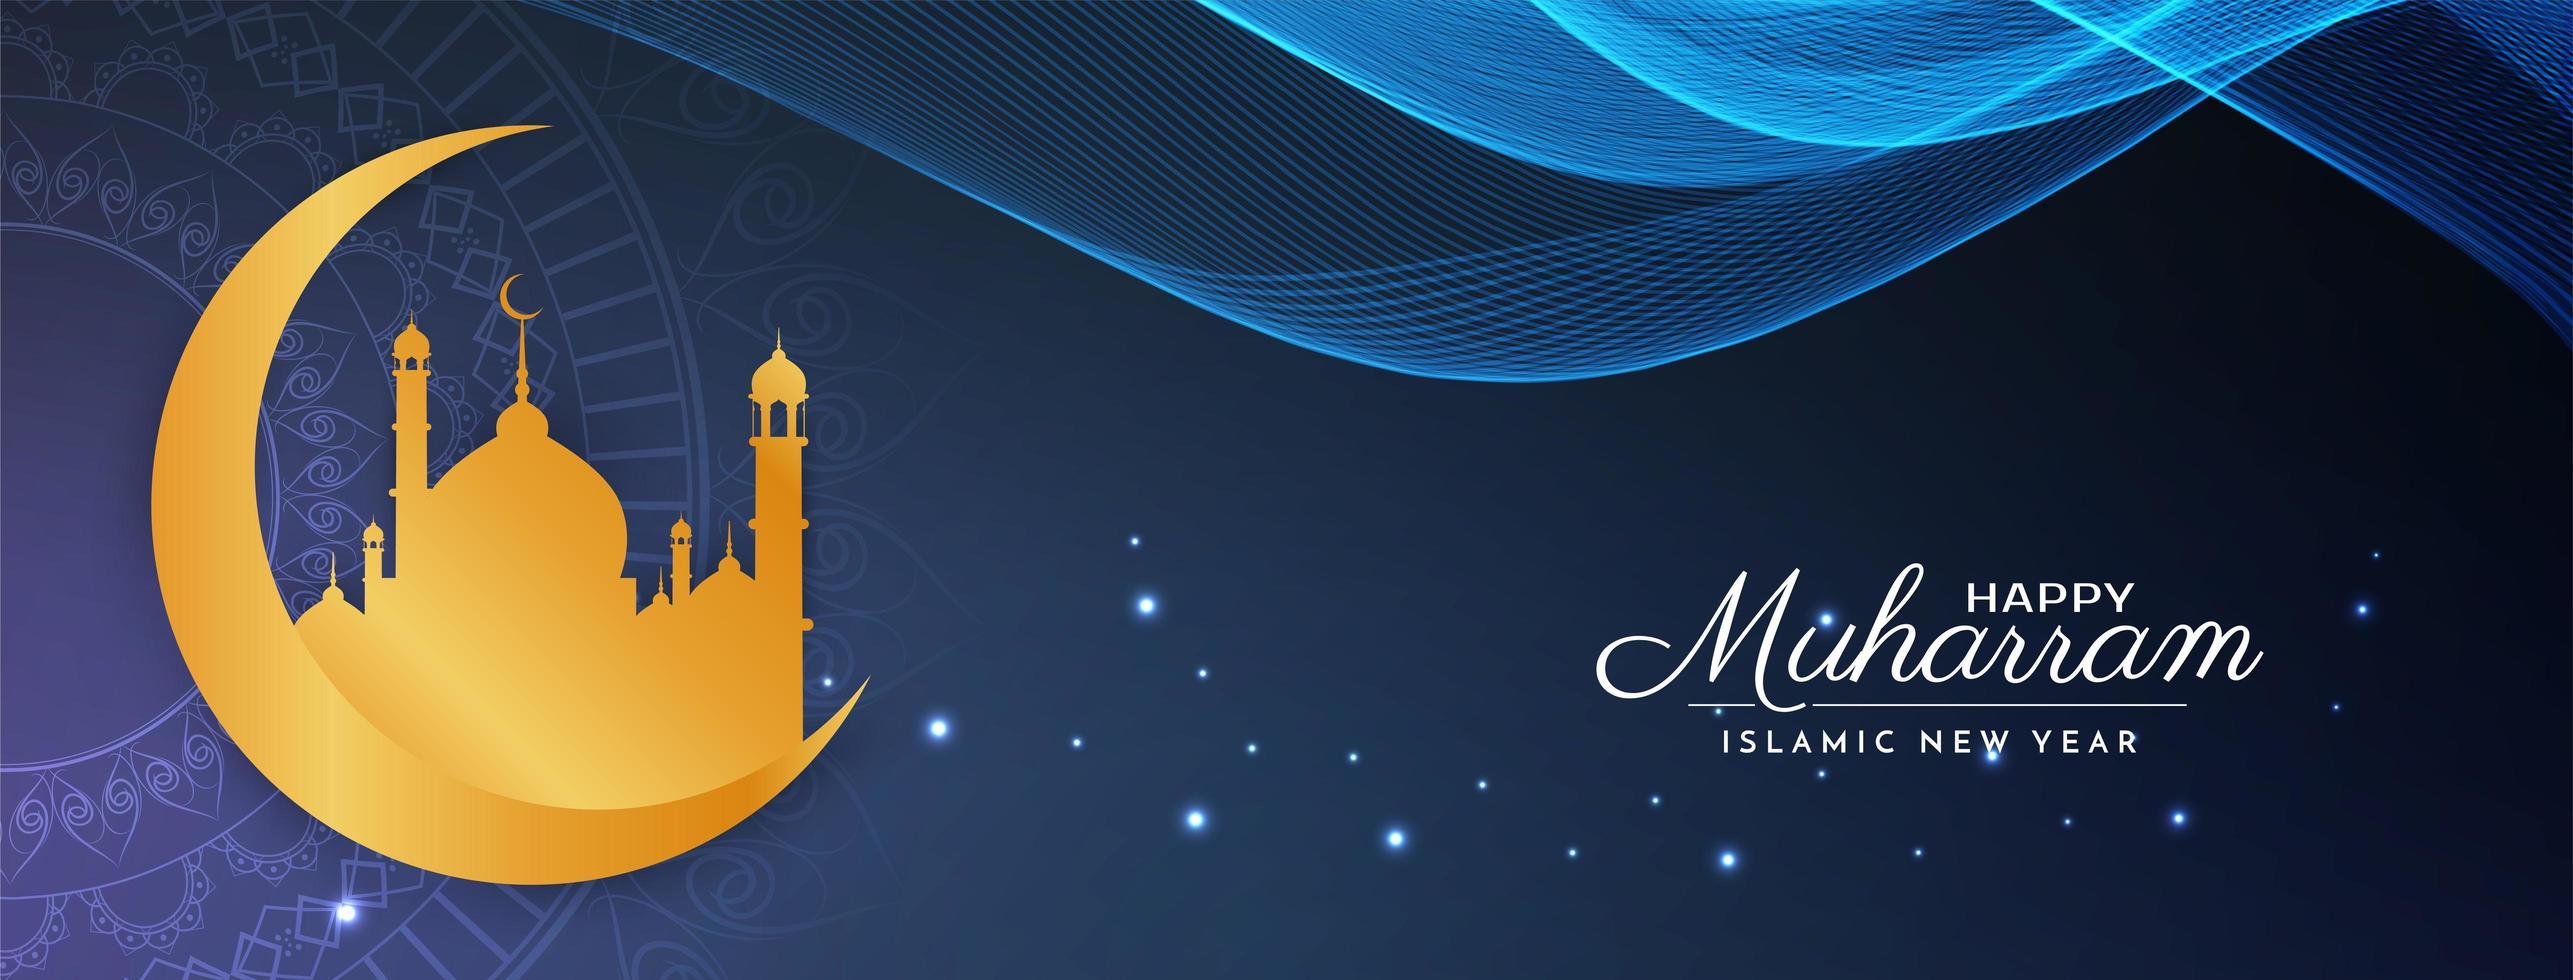 design elegante banner blu muharram felice ondulato vettore